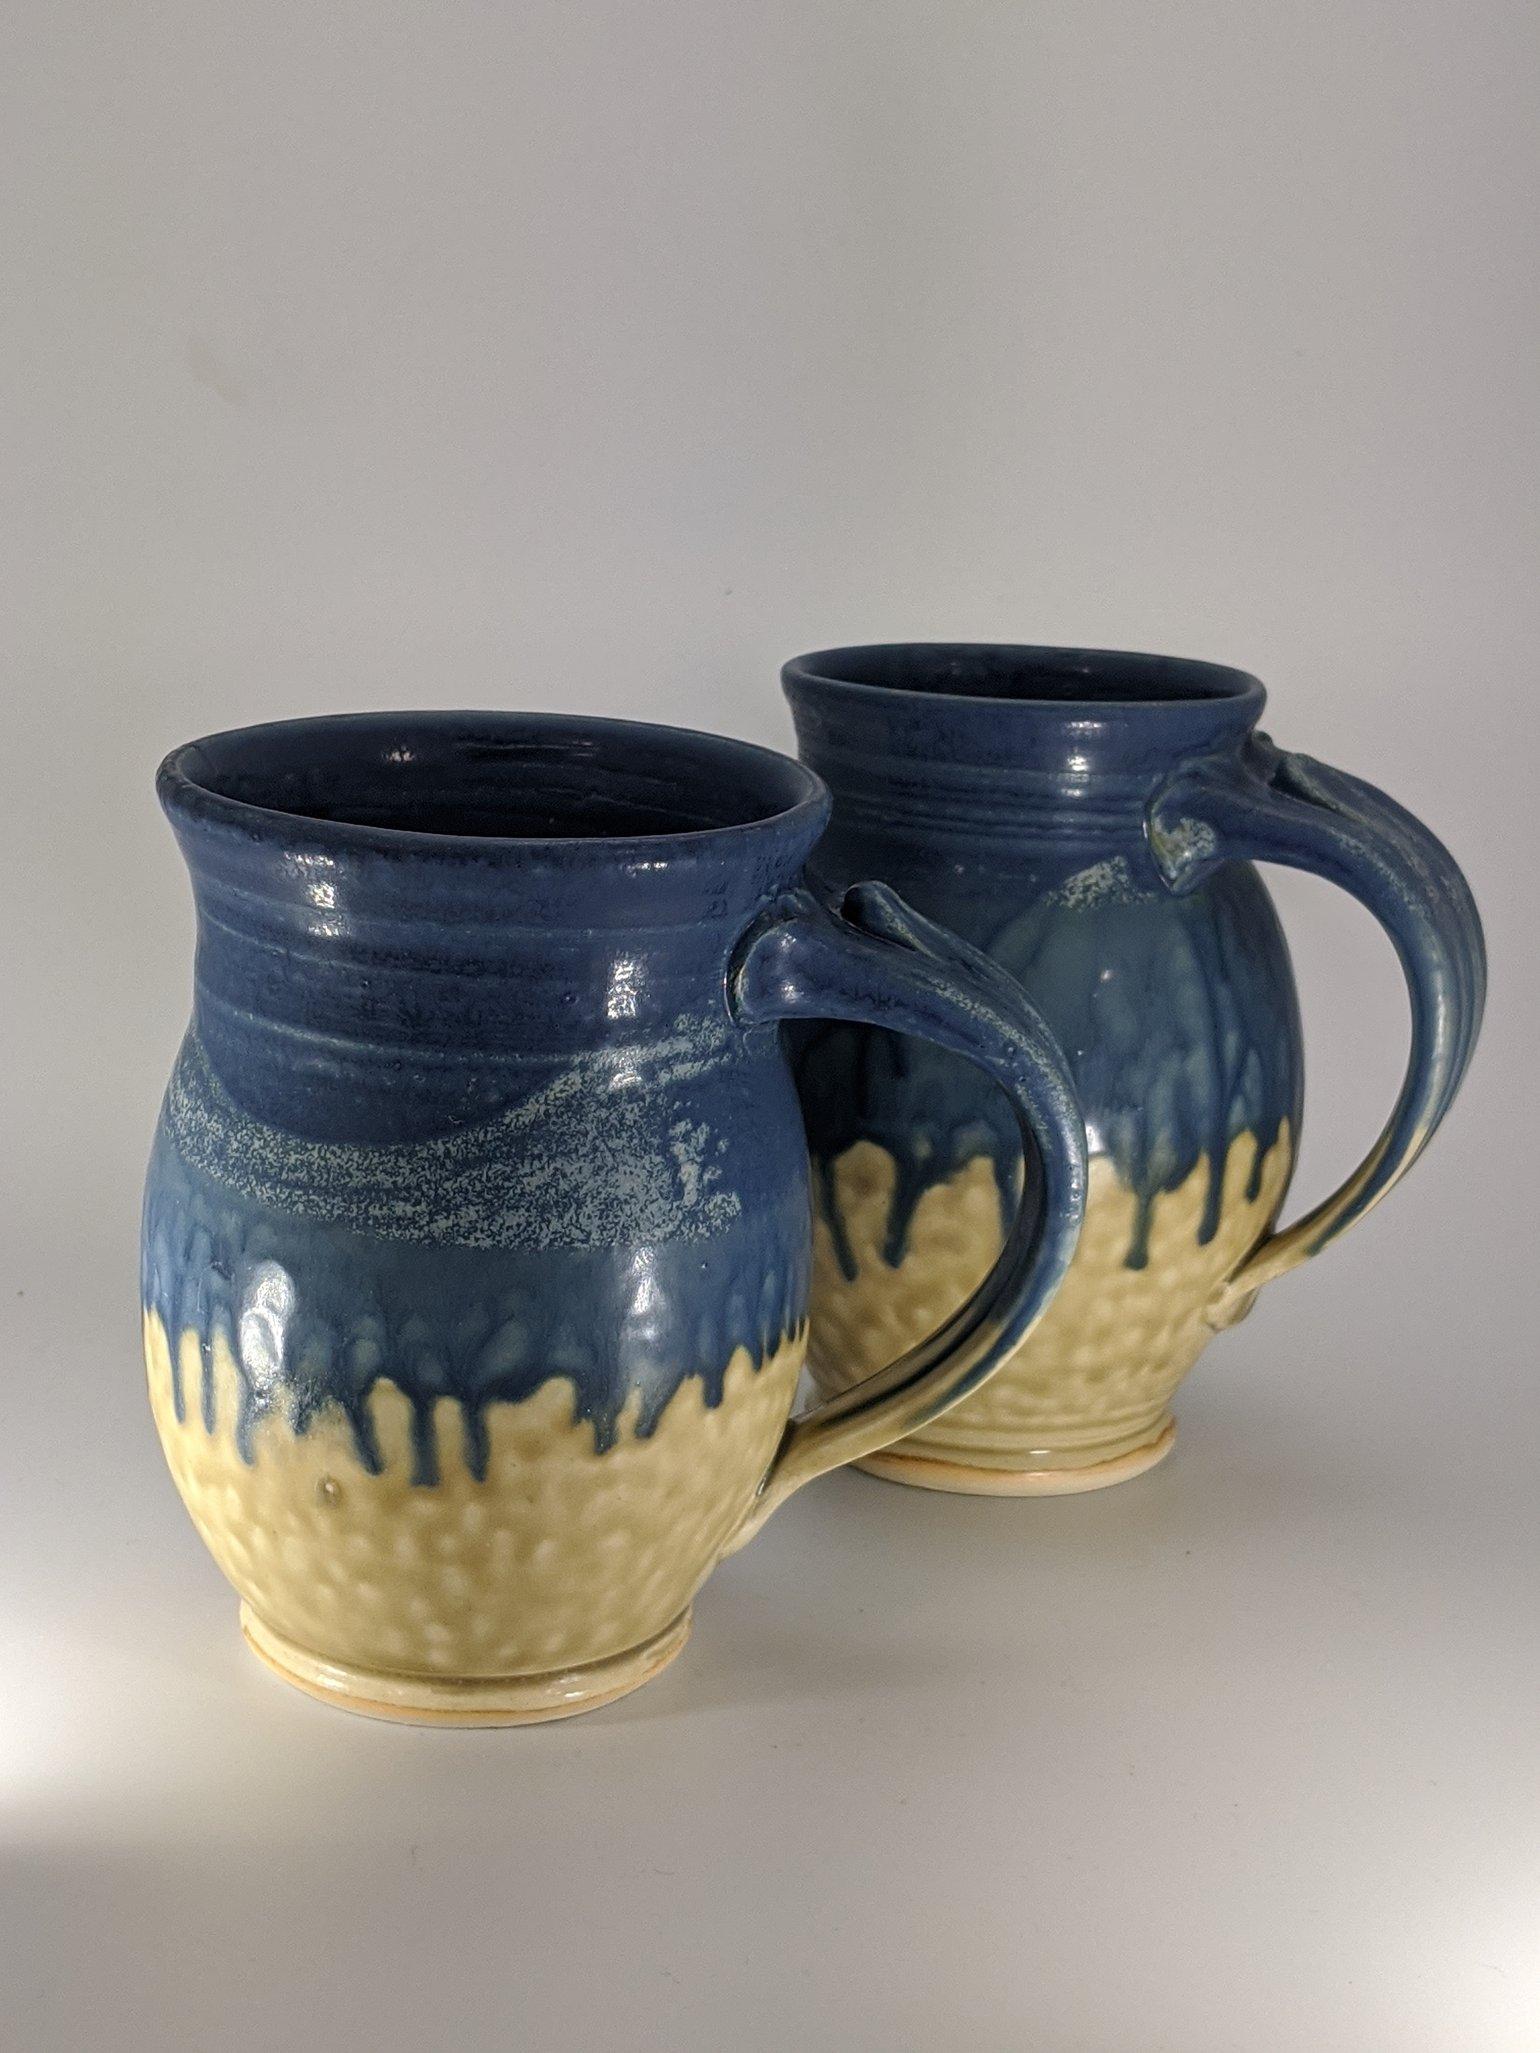 Image of Pair of Sunset Mugs